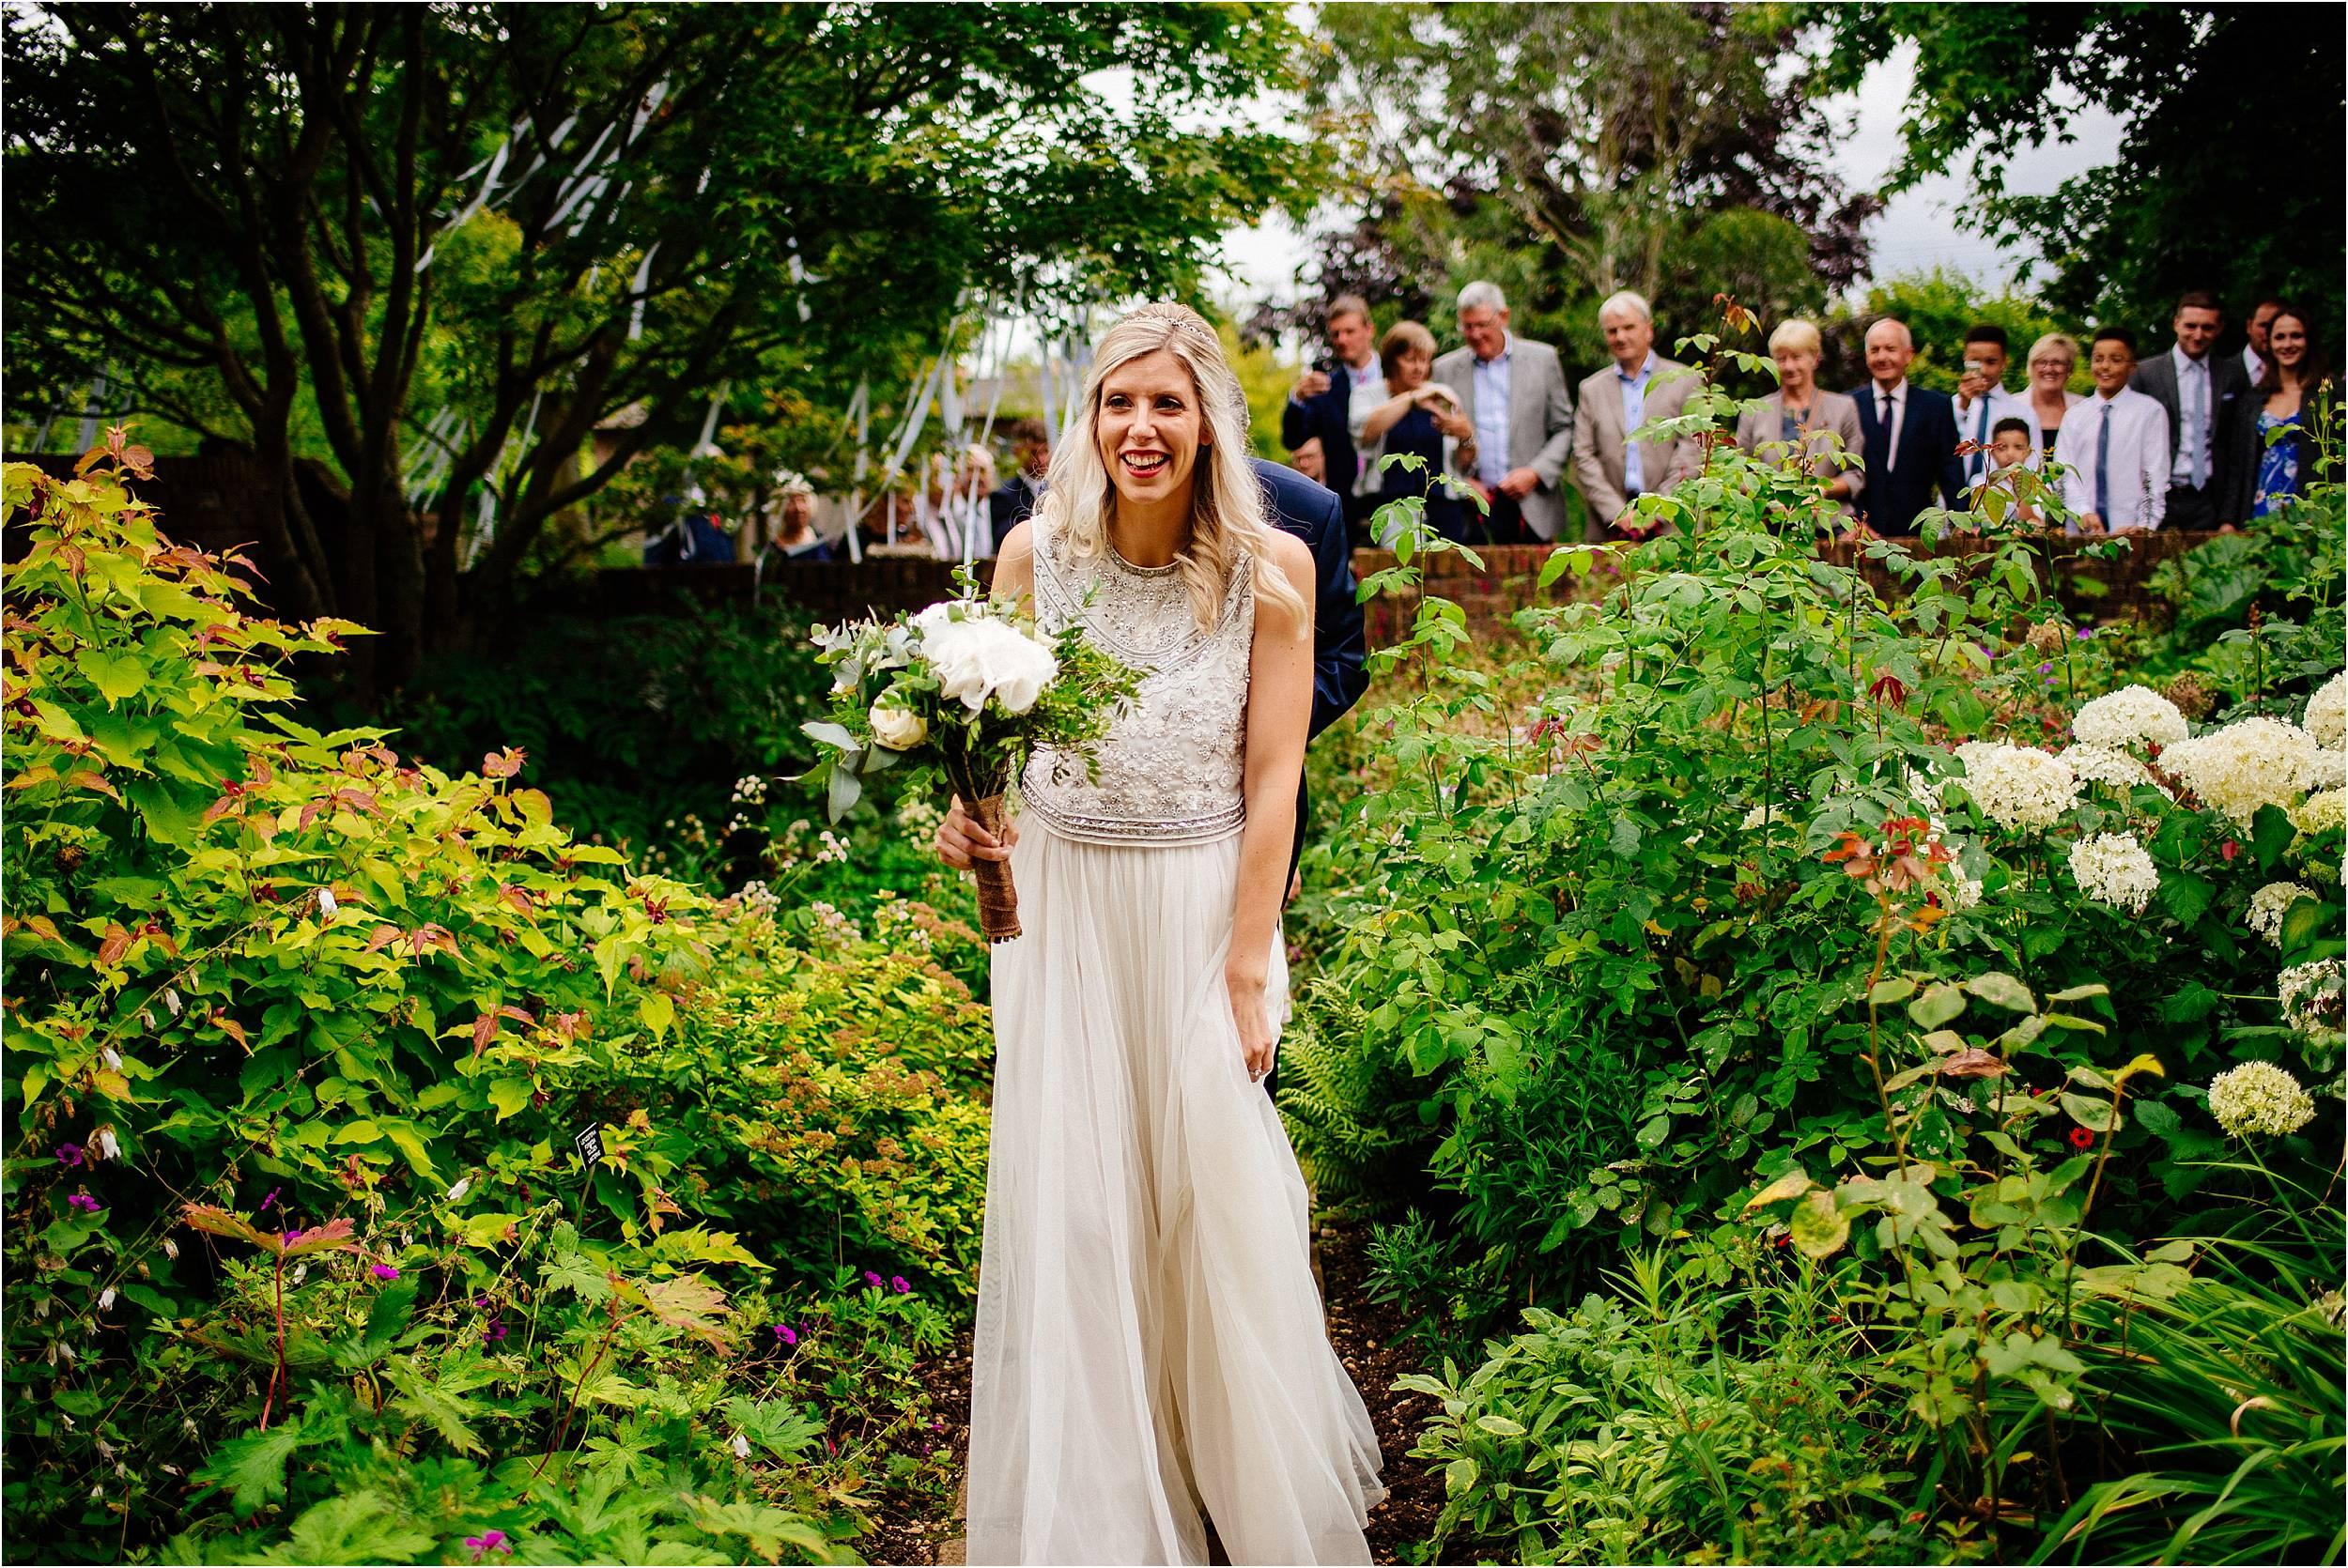 Barnsdale Gardens Wedding Photographer_0024.jpg